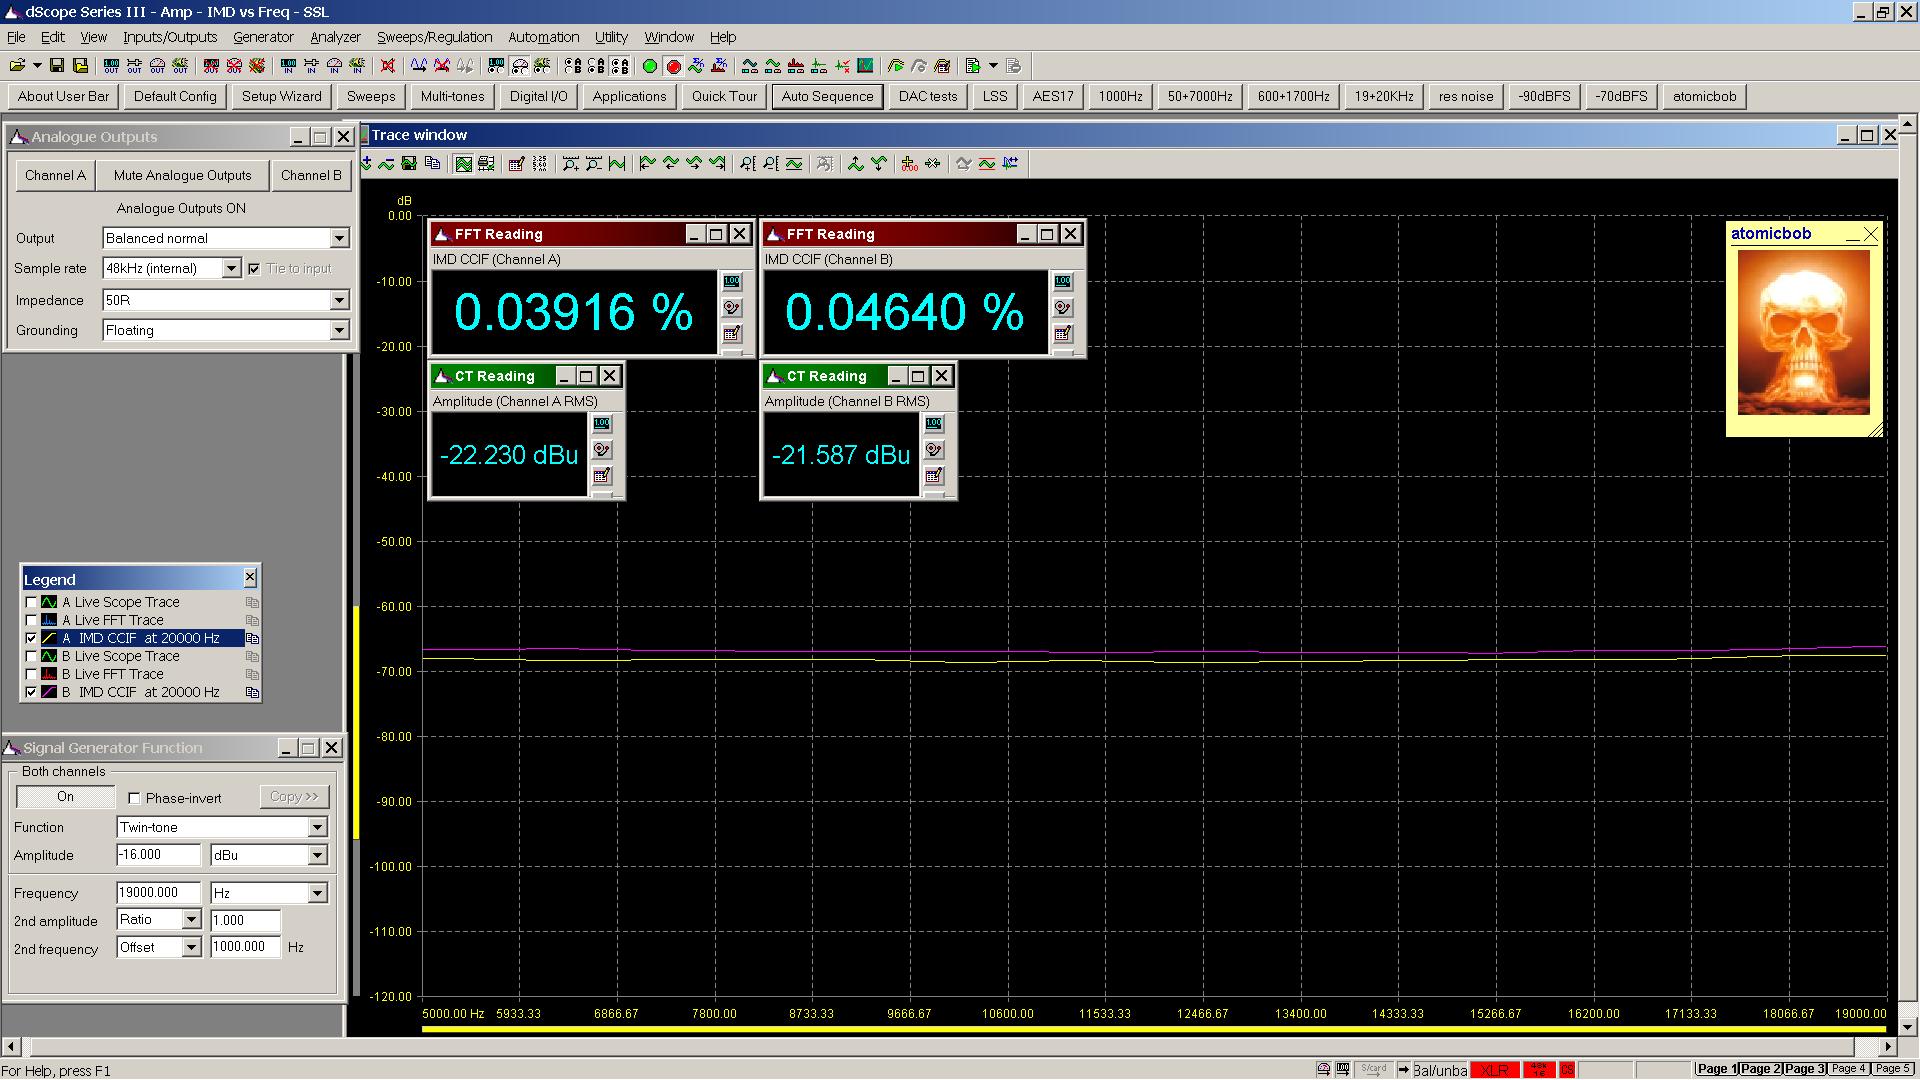 20191007 SW51+ 6Z51P 19+20KHz IMD sweep 20KHz to 5KHz 300R HiZ -10dB gain.png